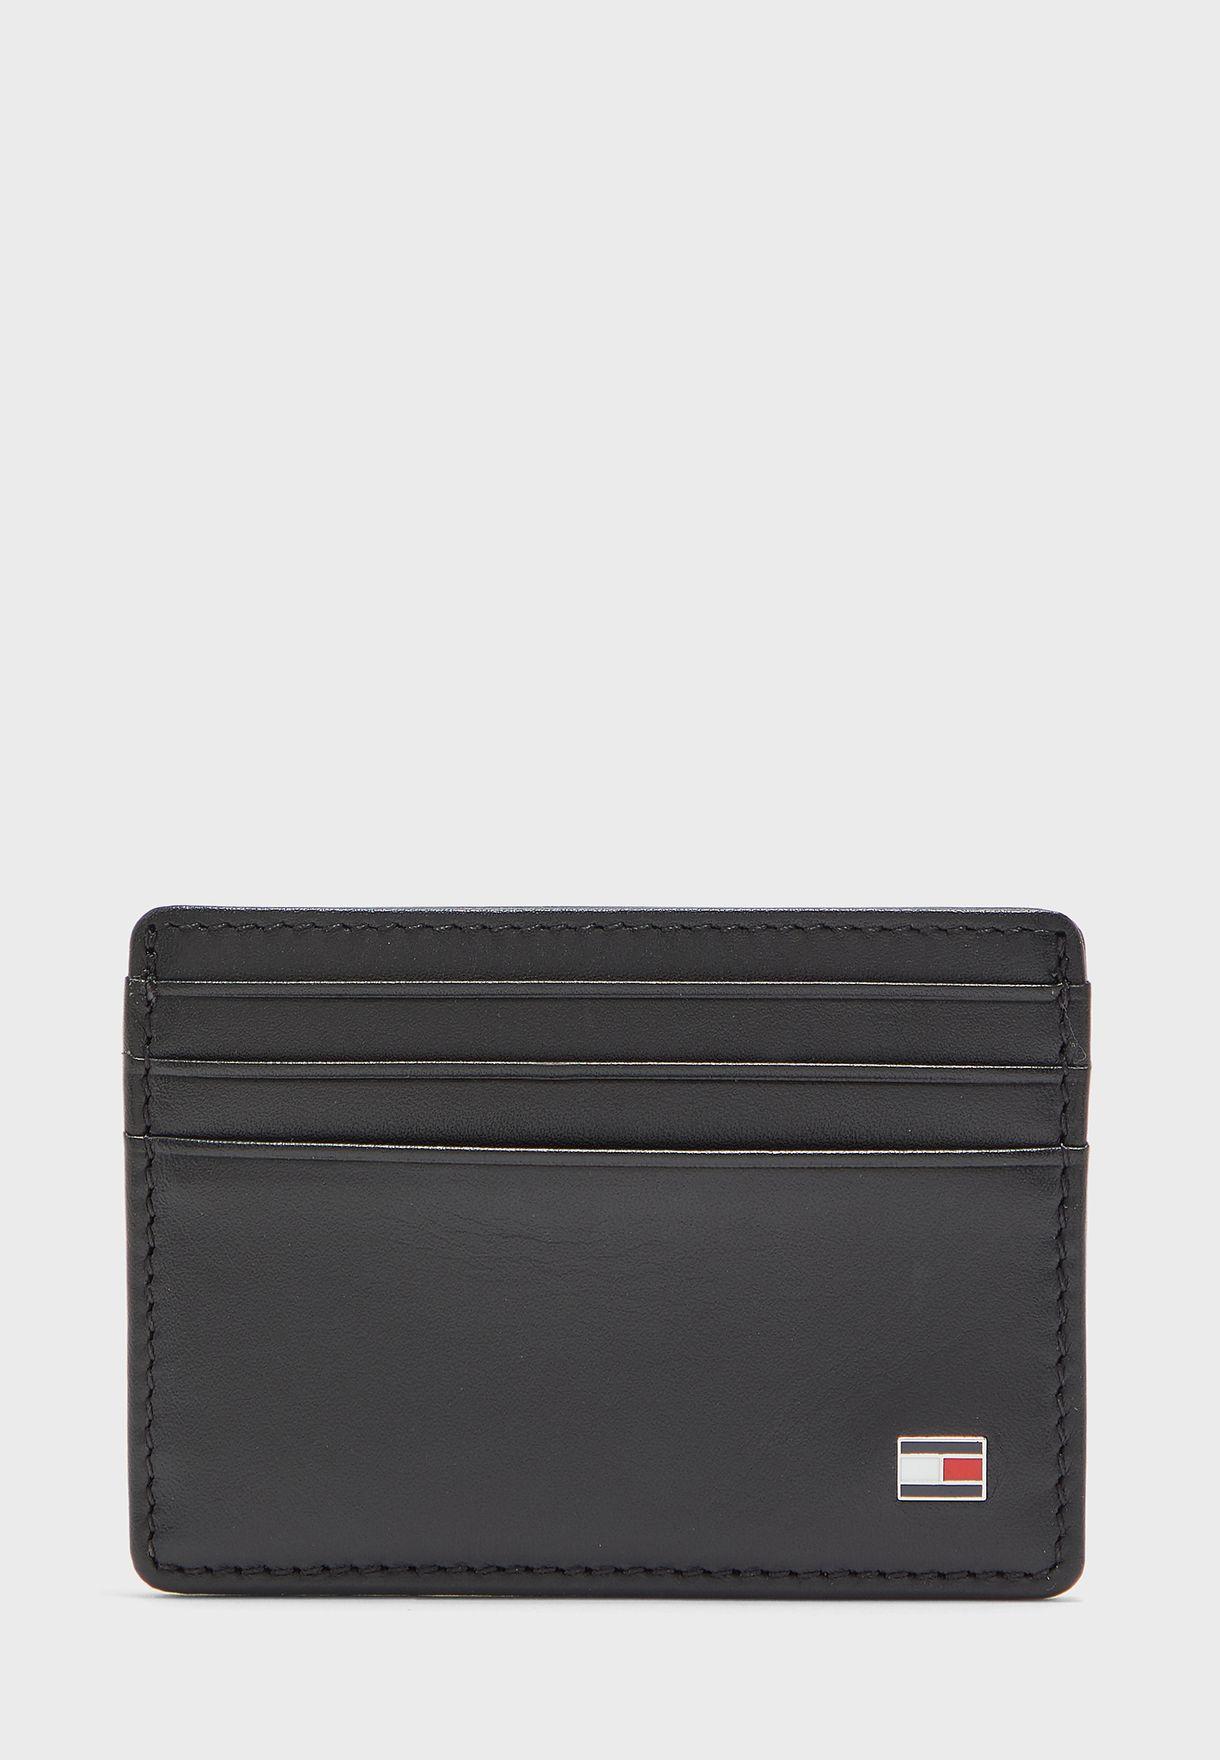 Eton Credit Card Holder